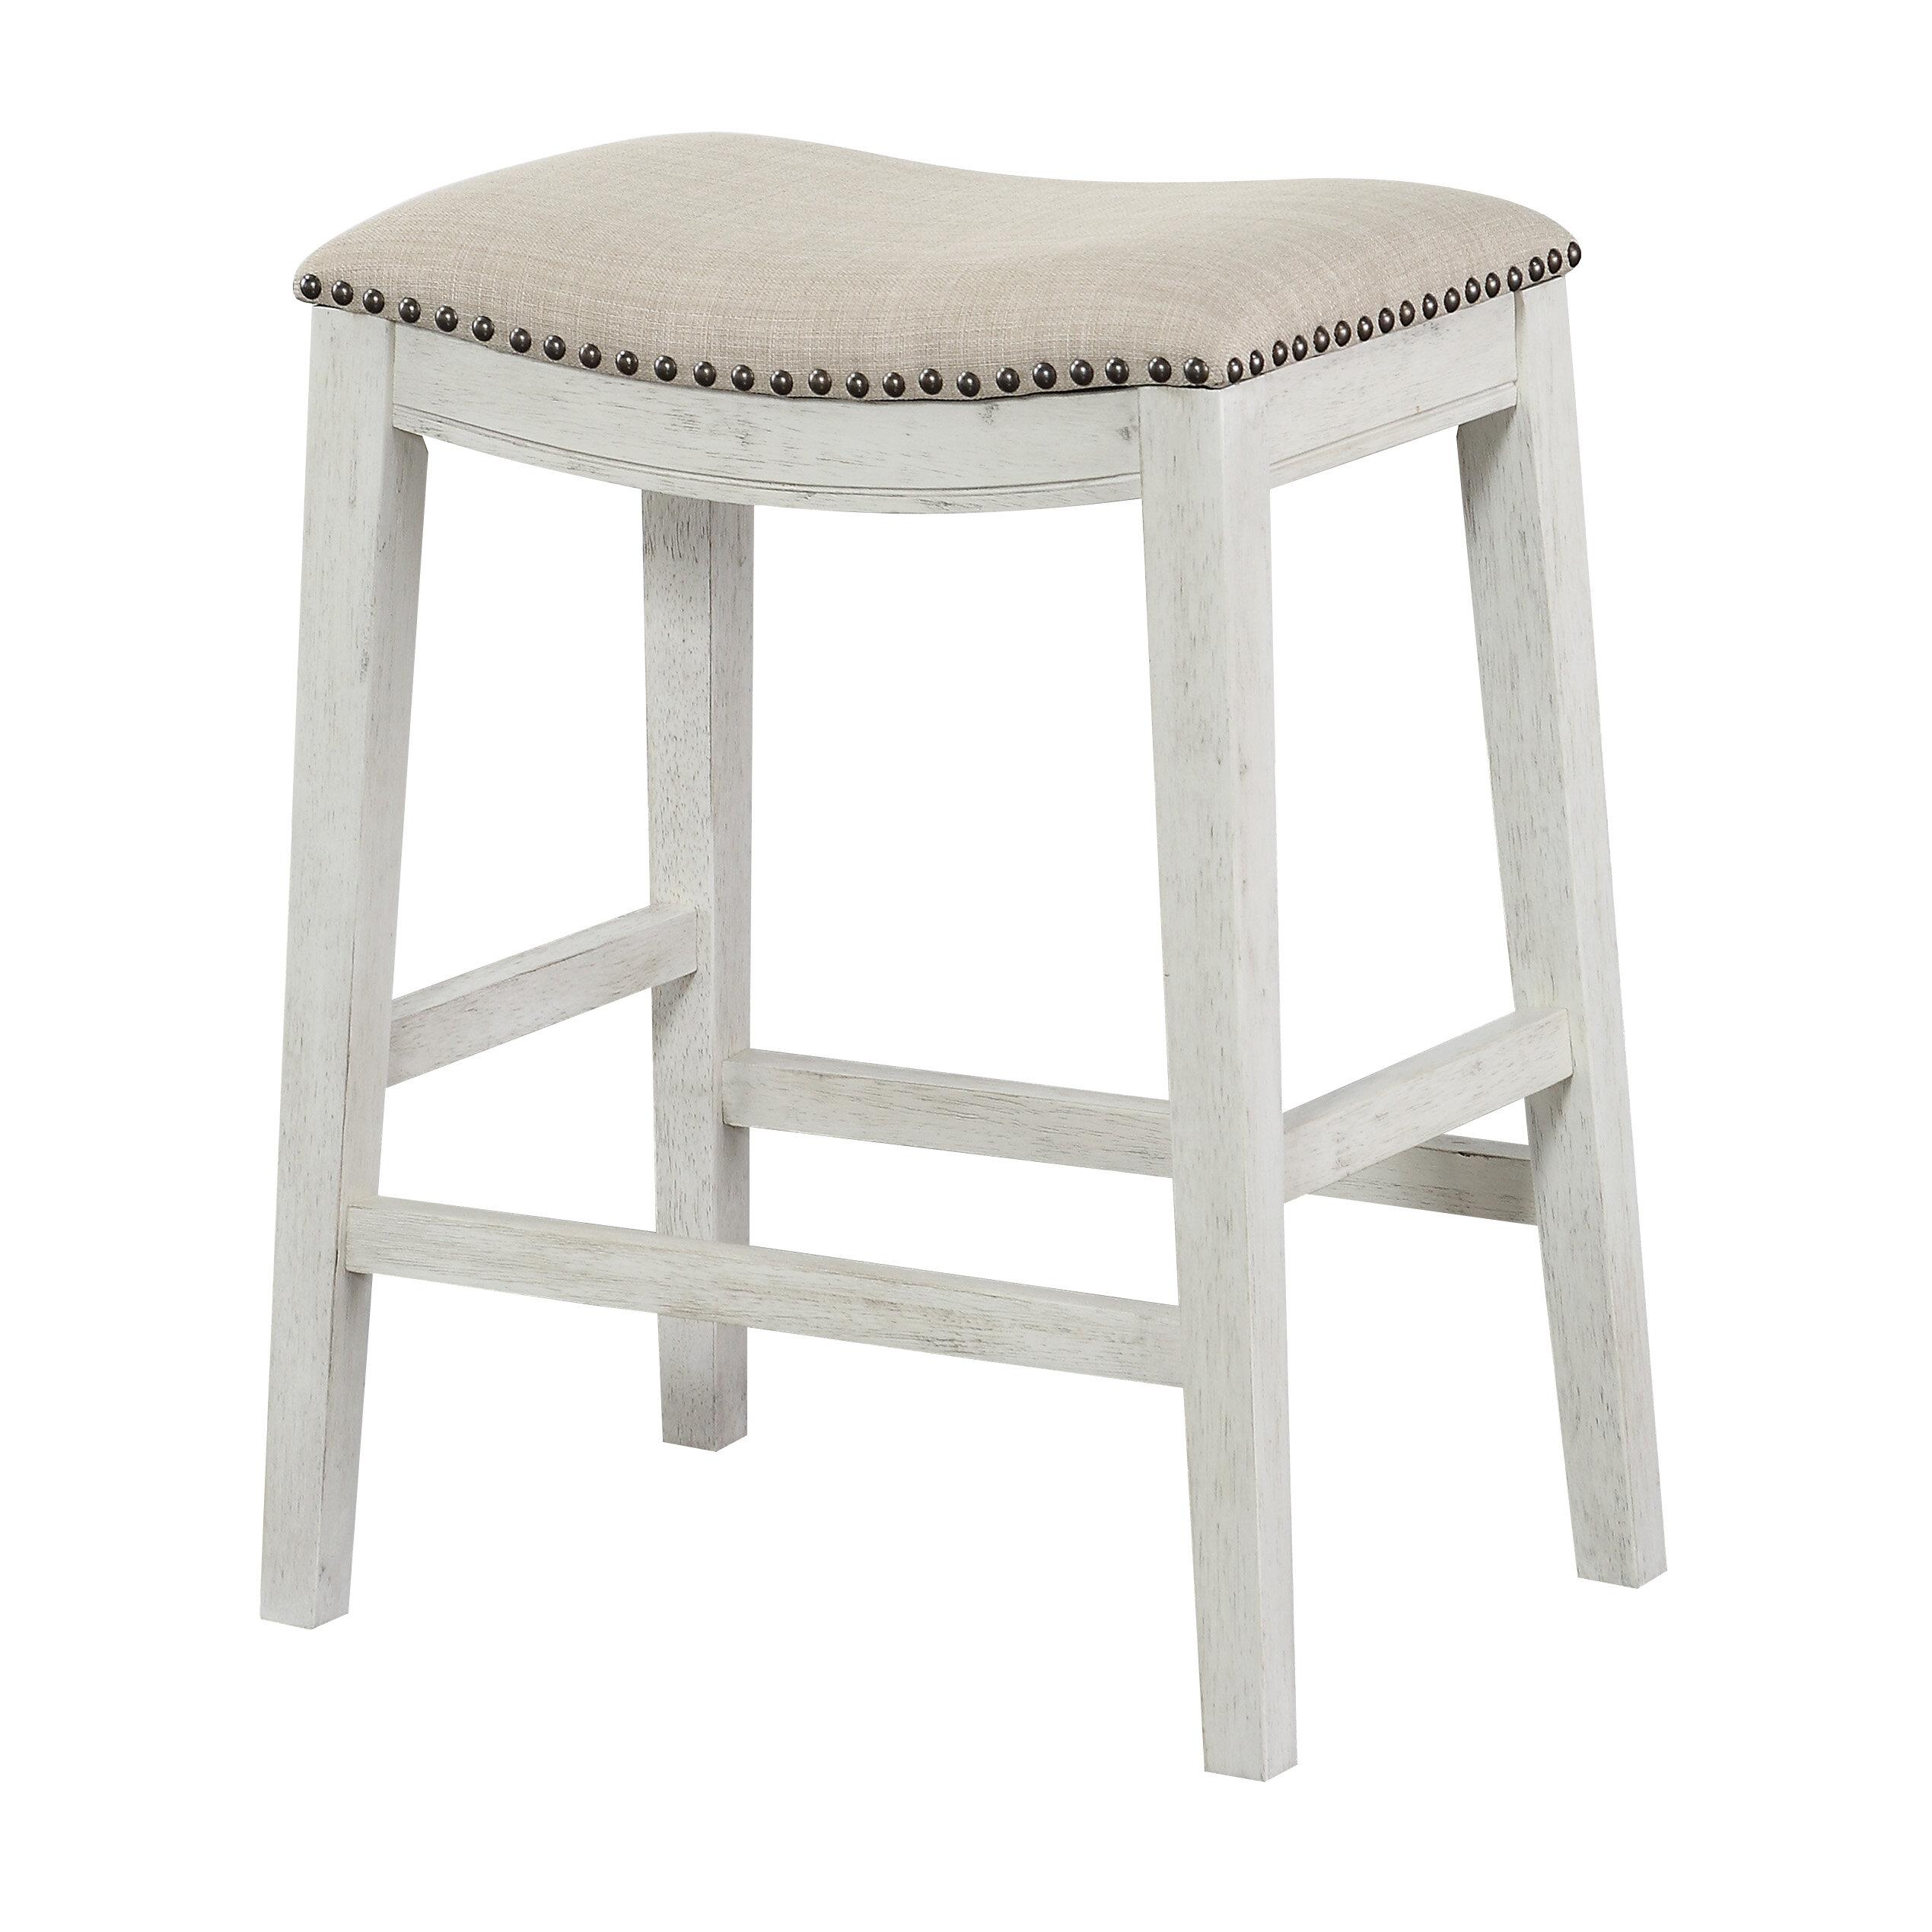 Tremendous Clewiston 24 75 Bar Stool Cjindustries Chair Design For Home Cjindustriesco